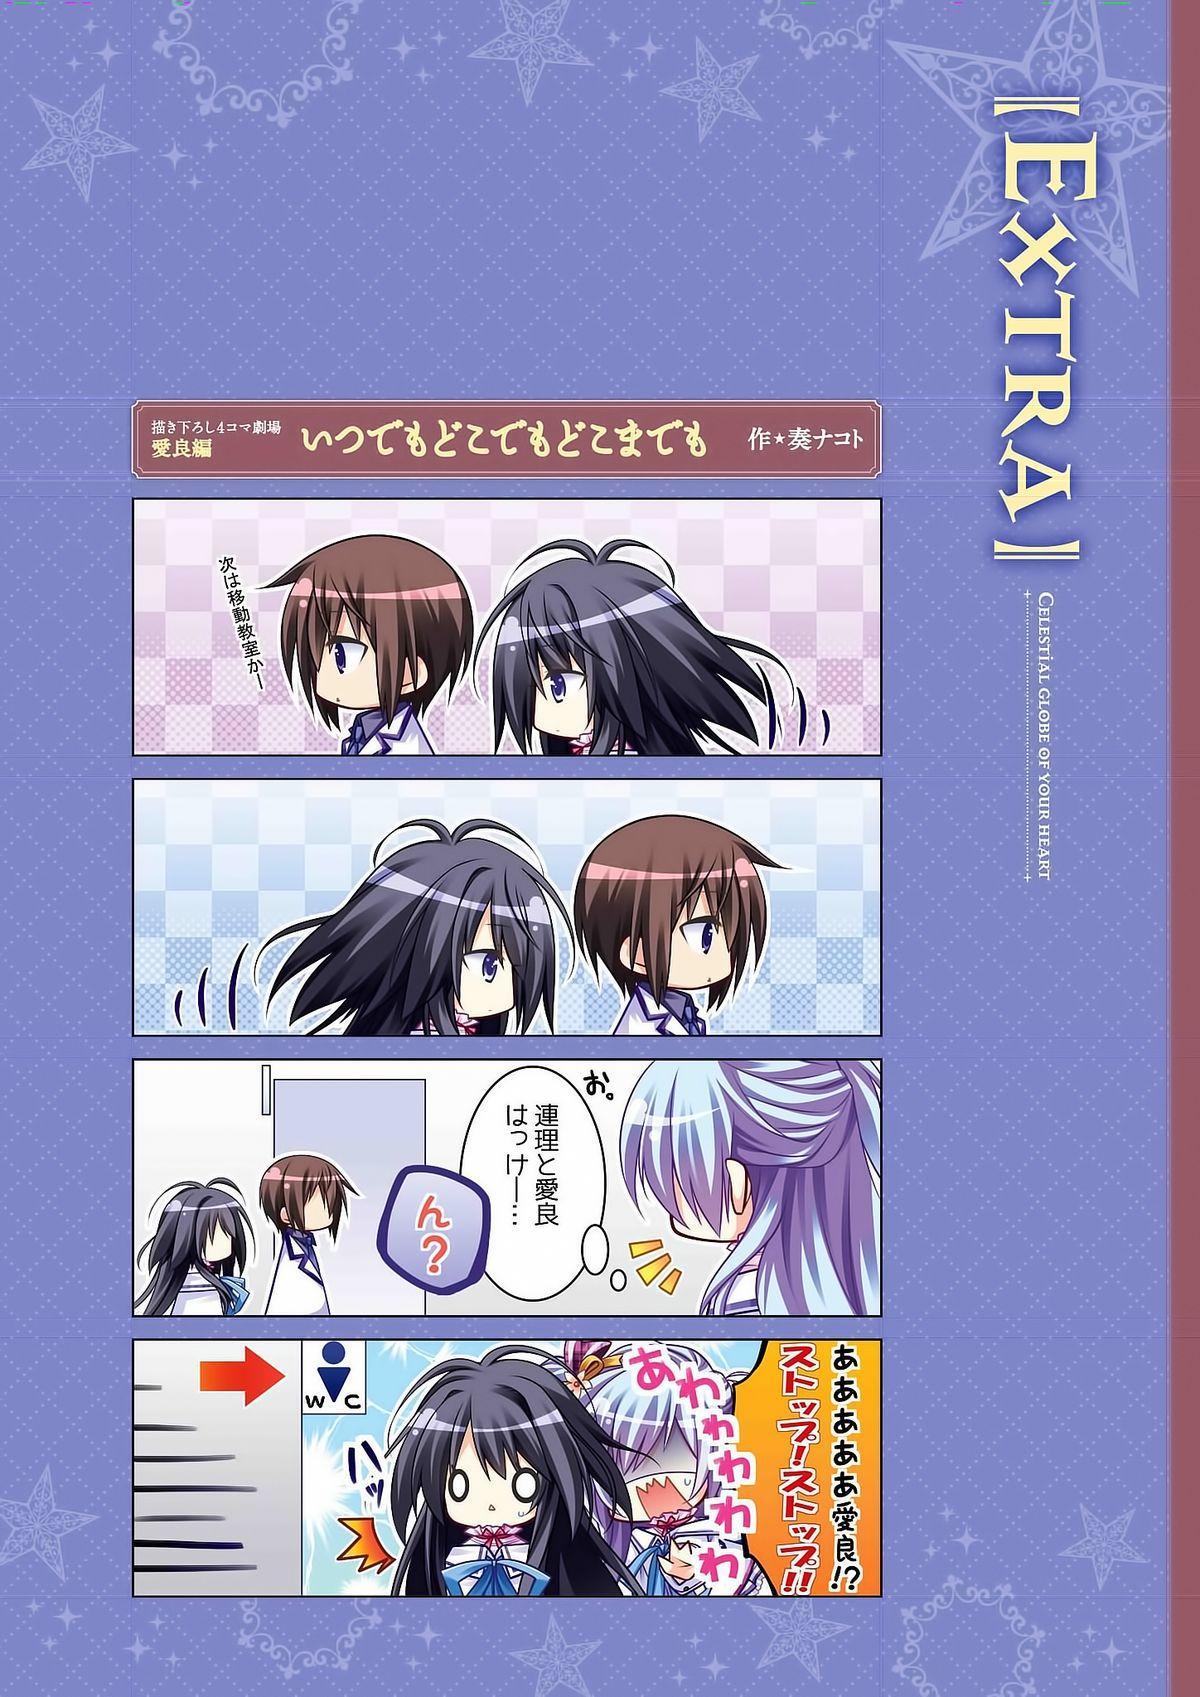 Sekai to Sekai no Mannaka de Visual Fanbook 106